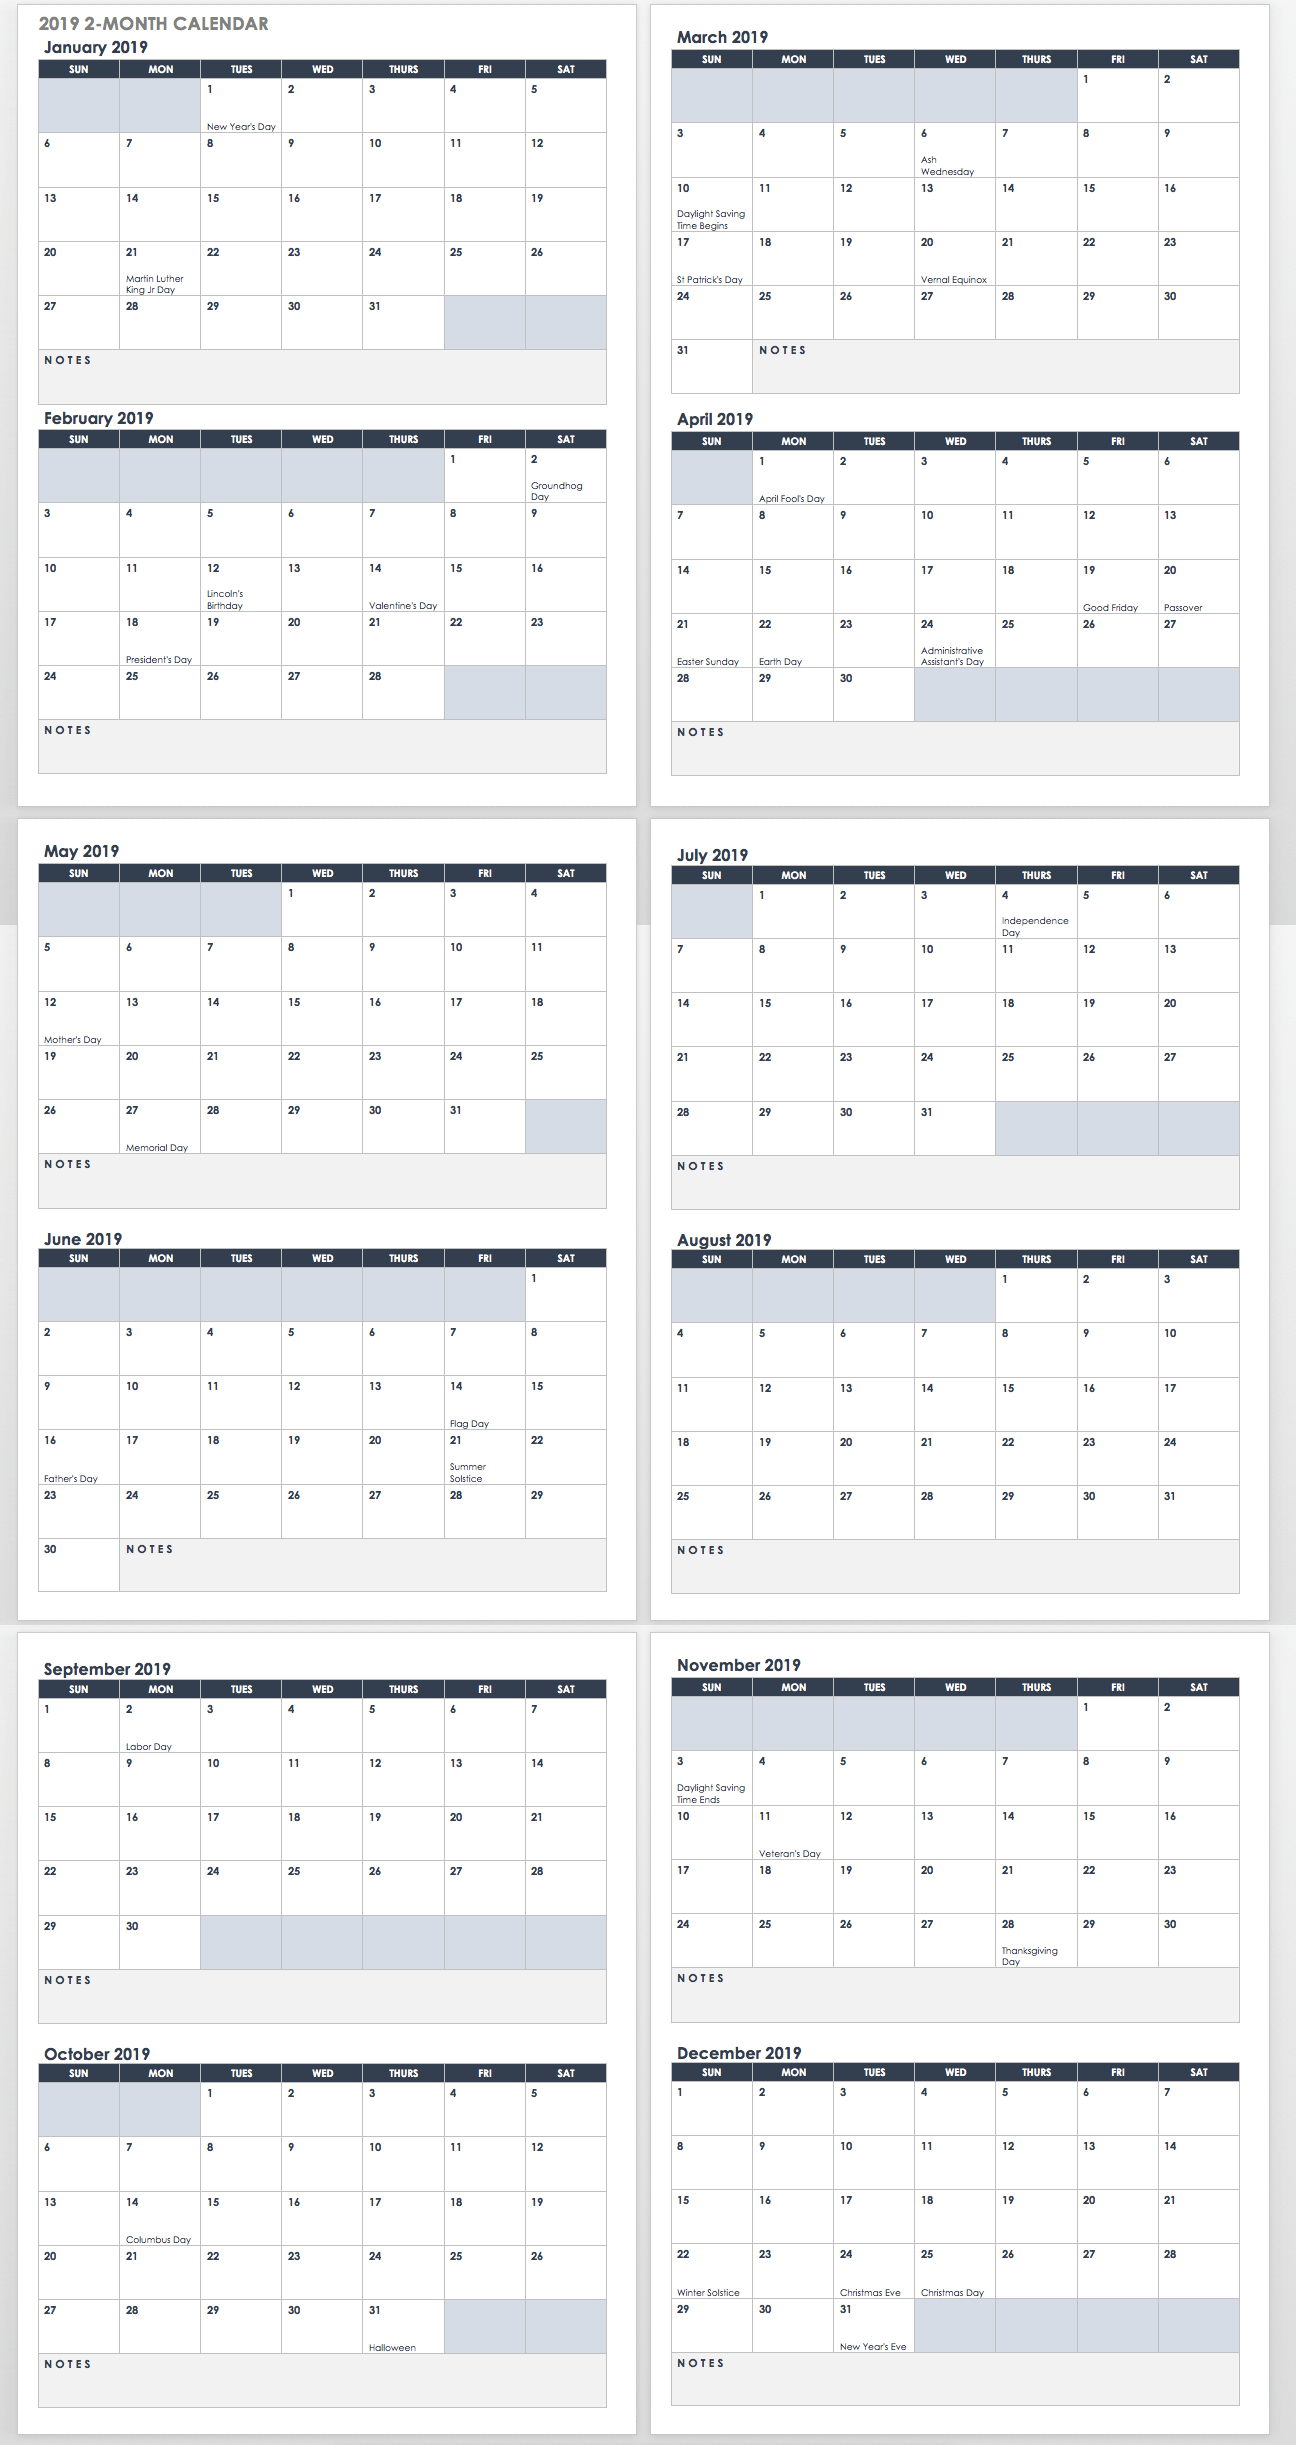 15 Free Monthly Calendar Templates | Smartsheet regarding Portriat Style Free Printable Calendar 2019-2020